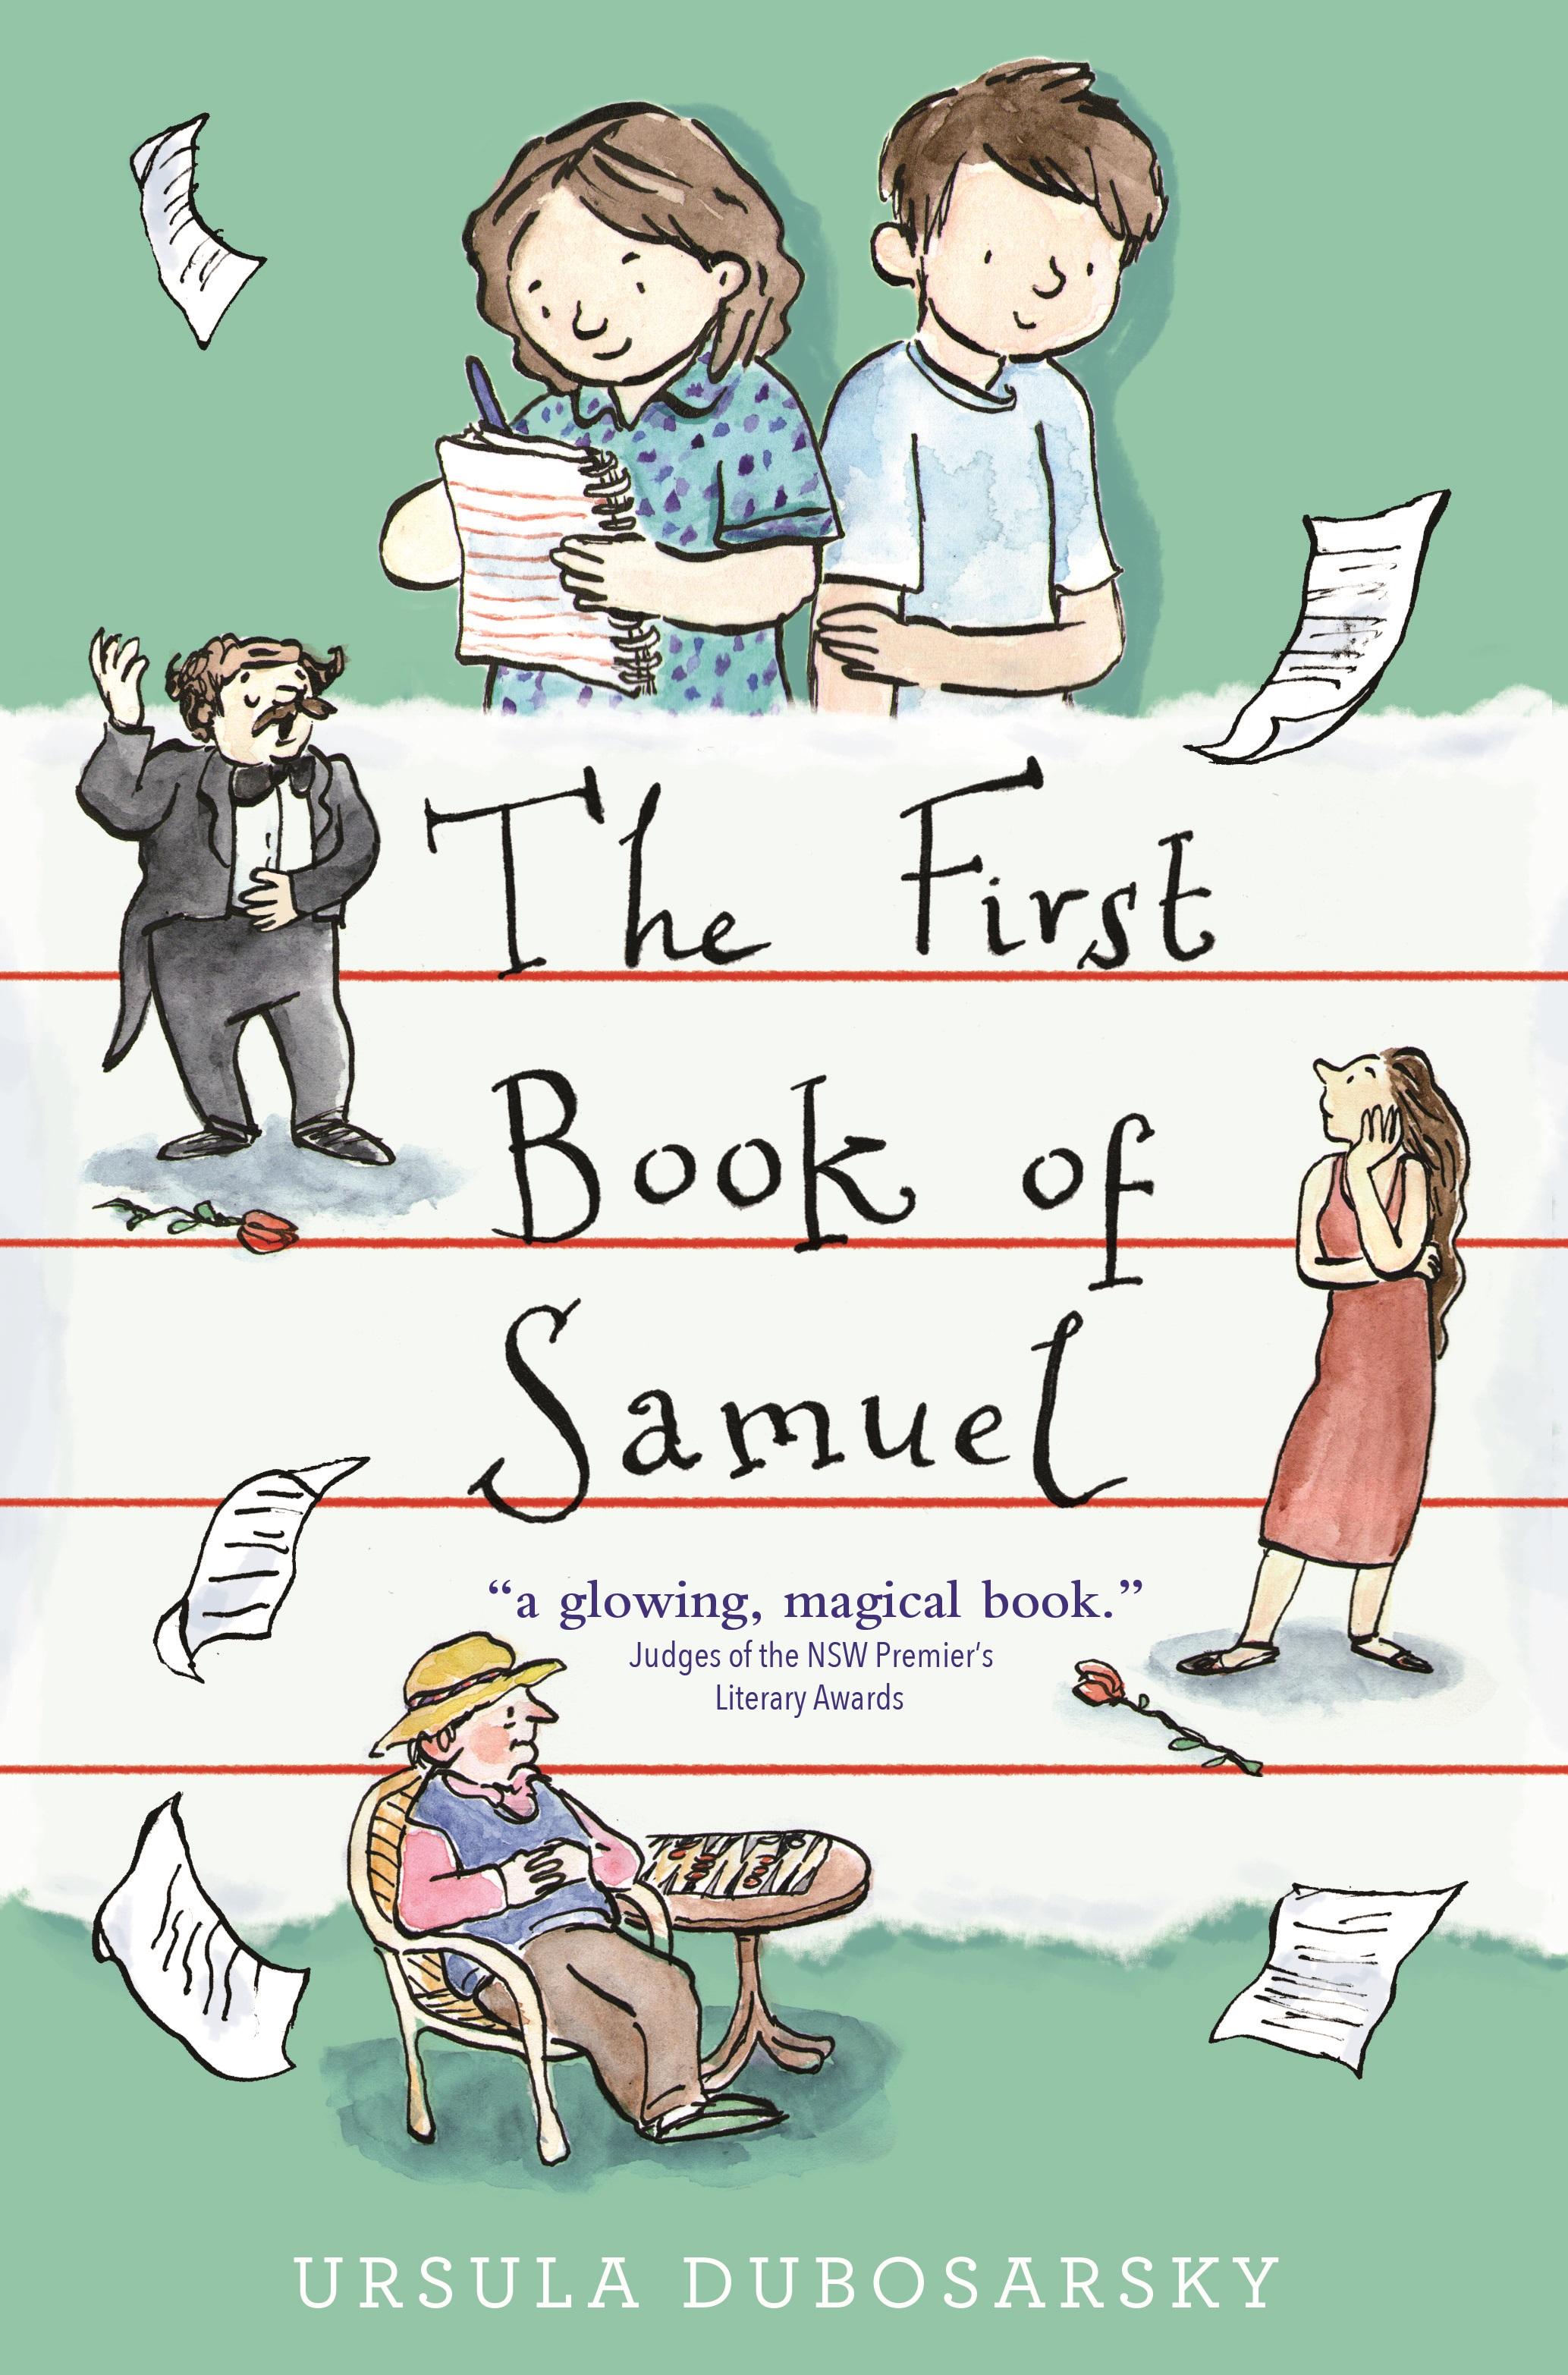 First Book of Samuel UD jpeg.jpg